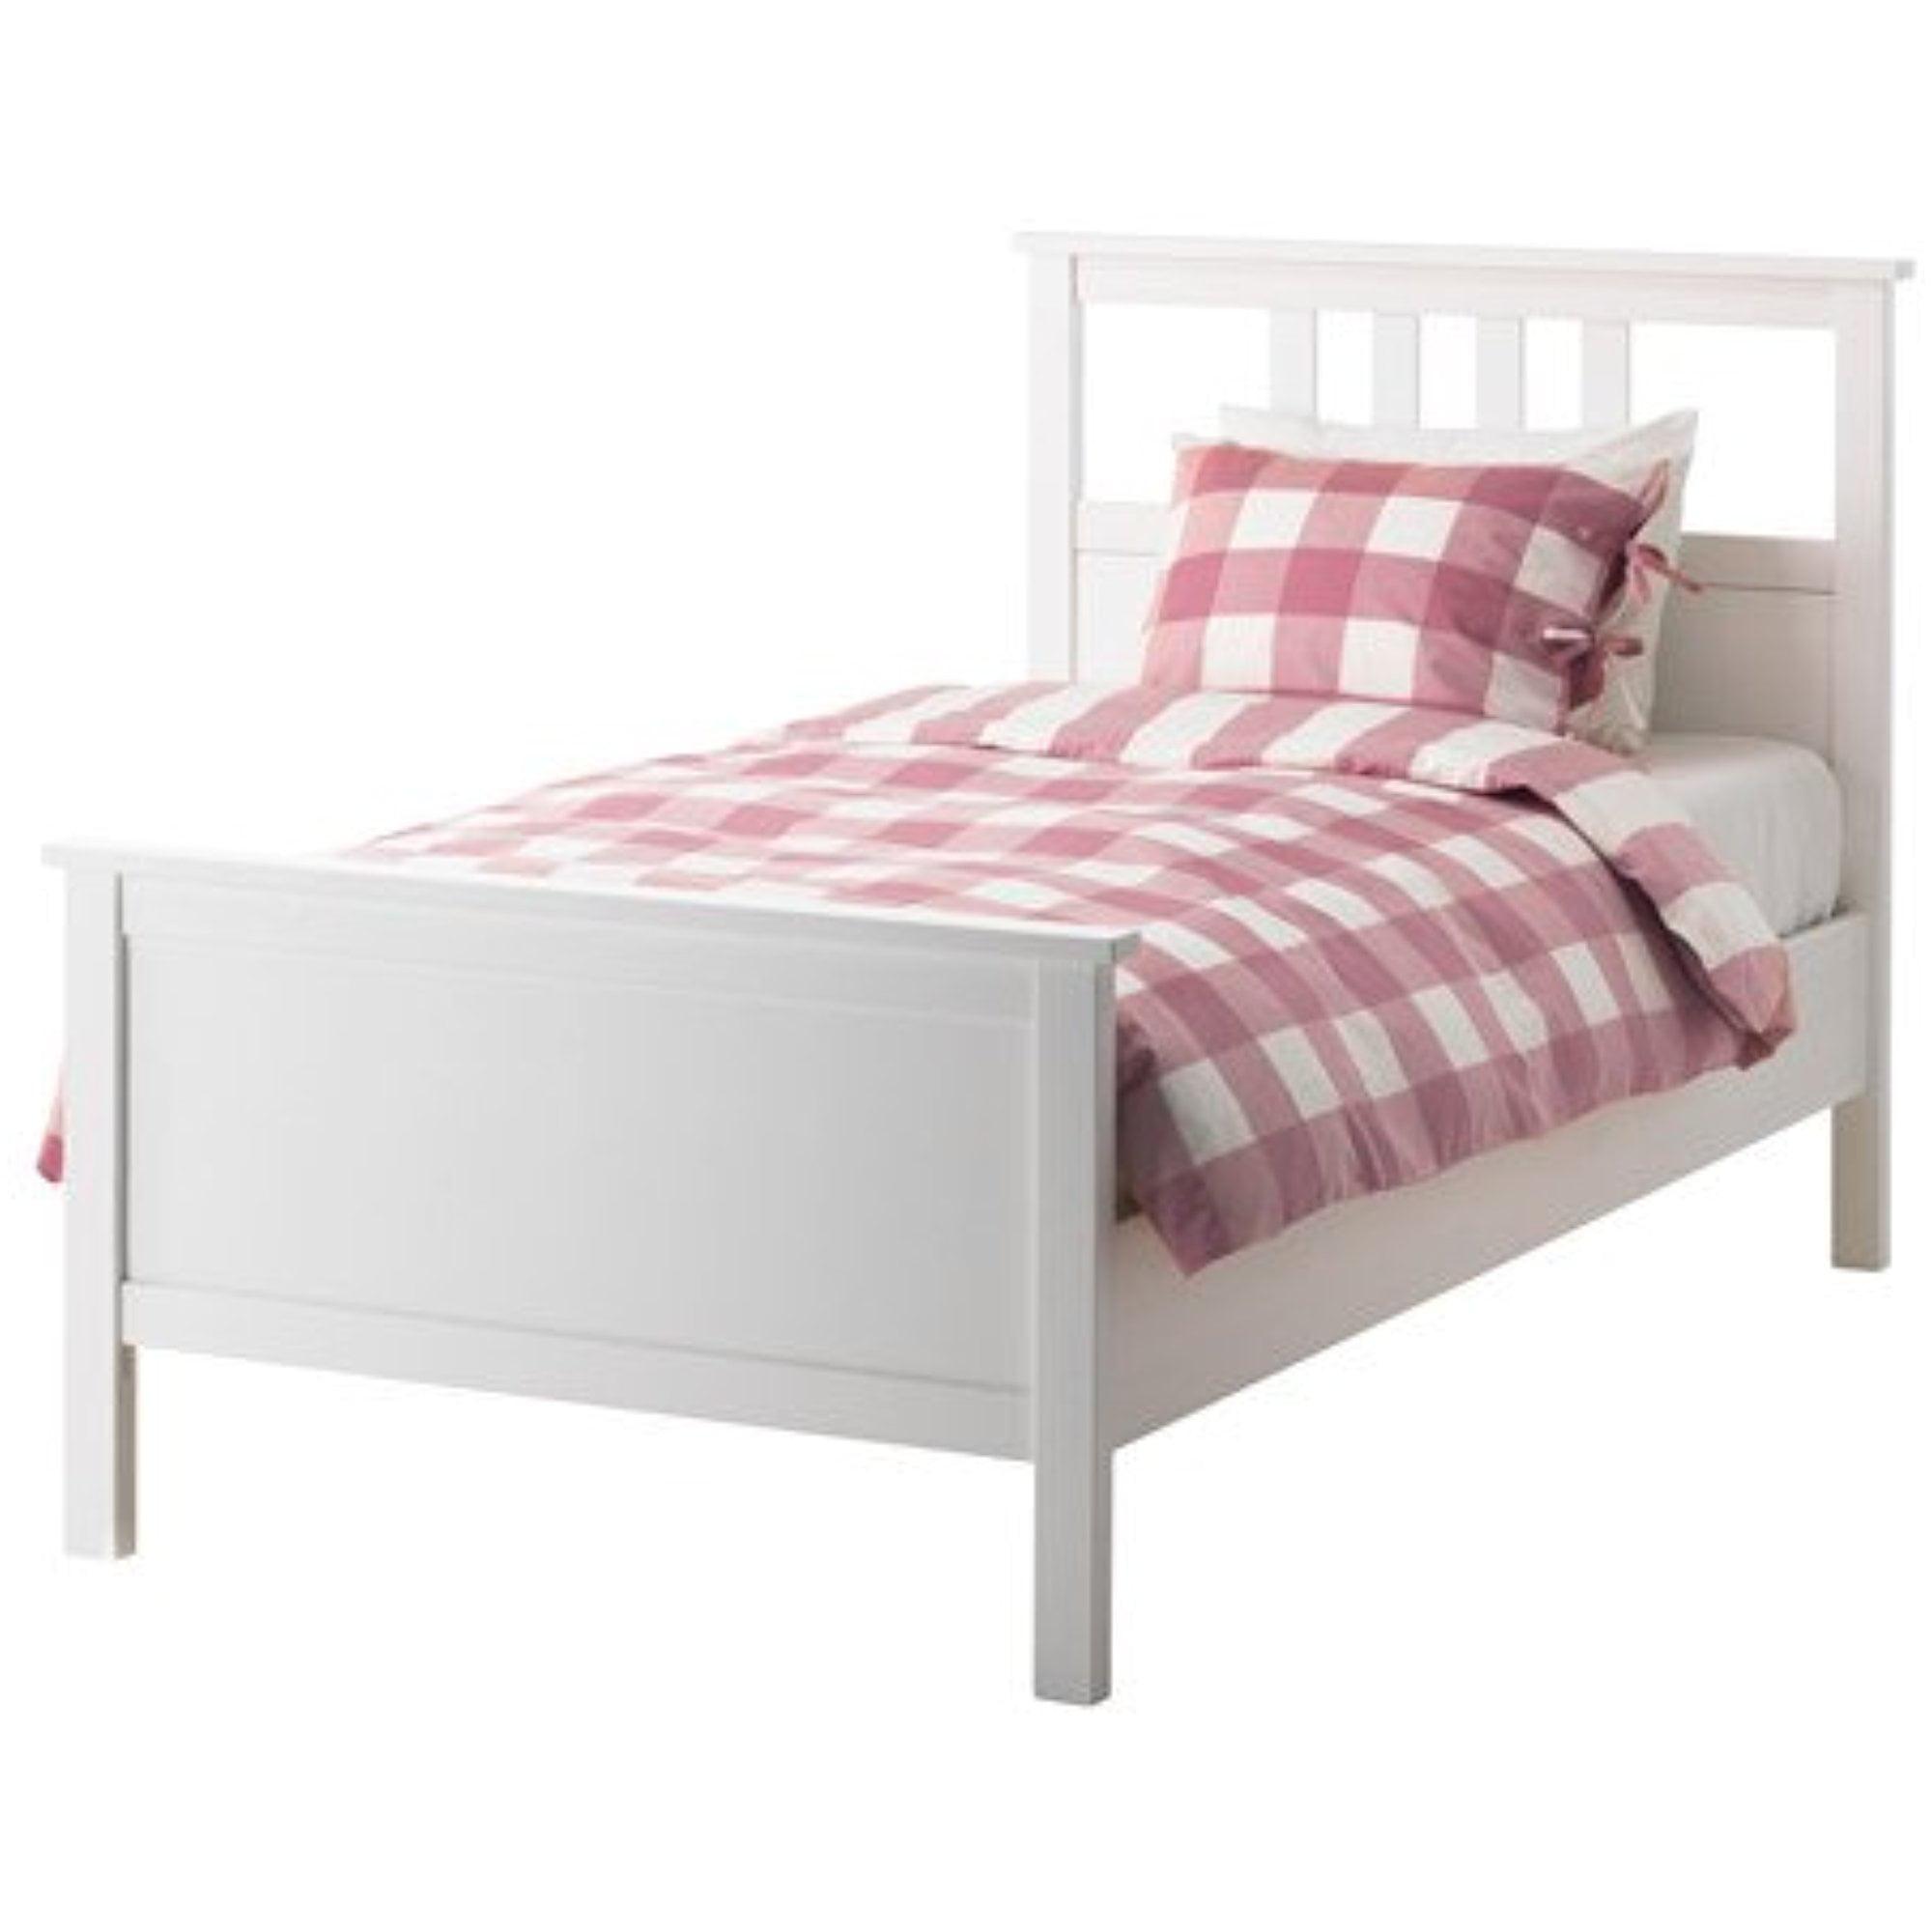 Ikea Twin Size Bed Frame White Stain 18210 142917 142 Walmart Com Walmart Com